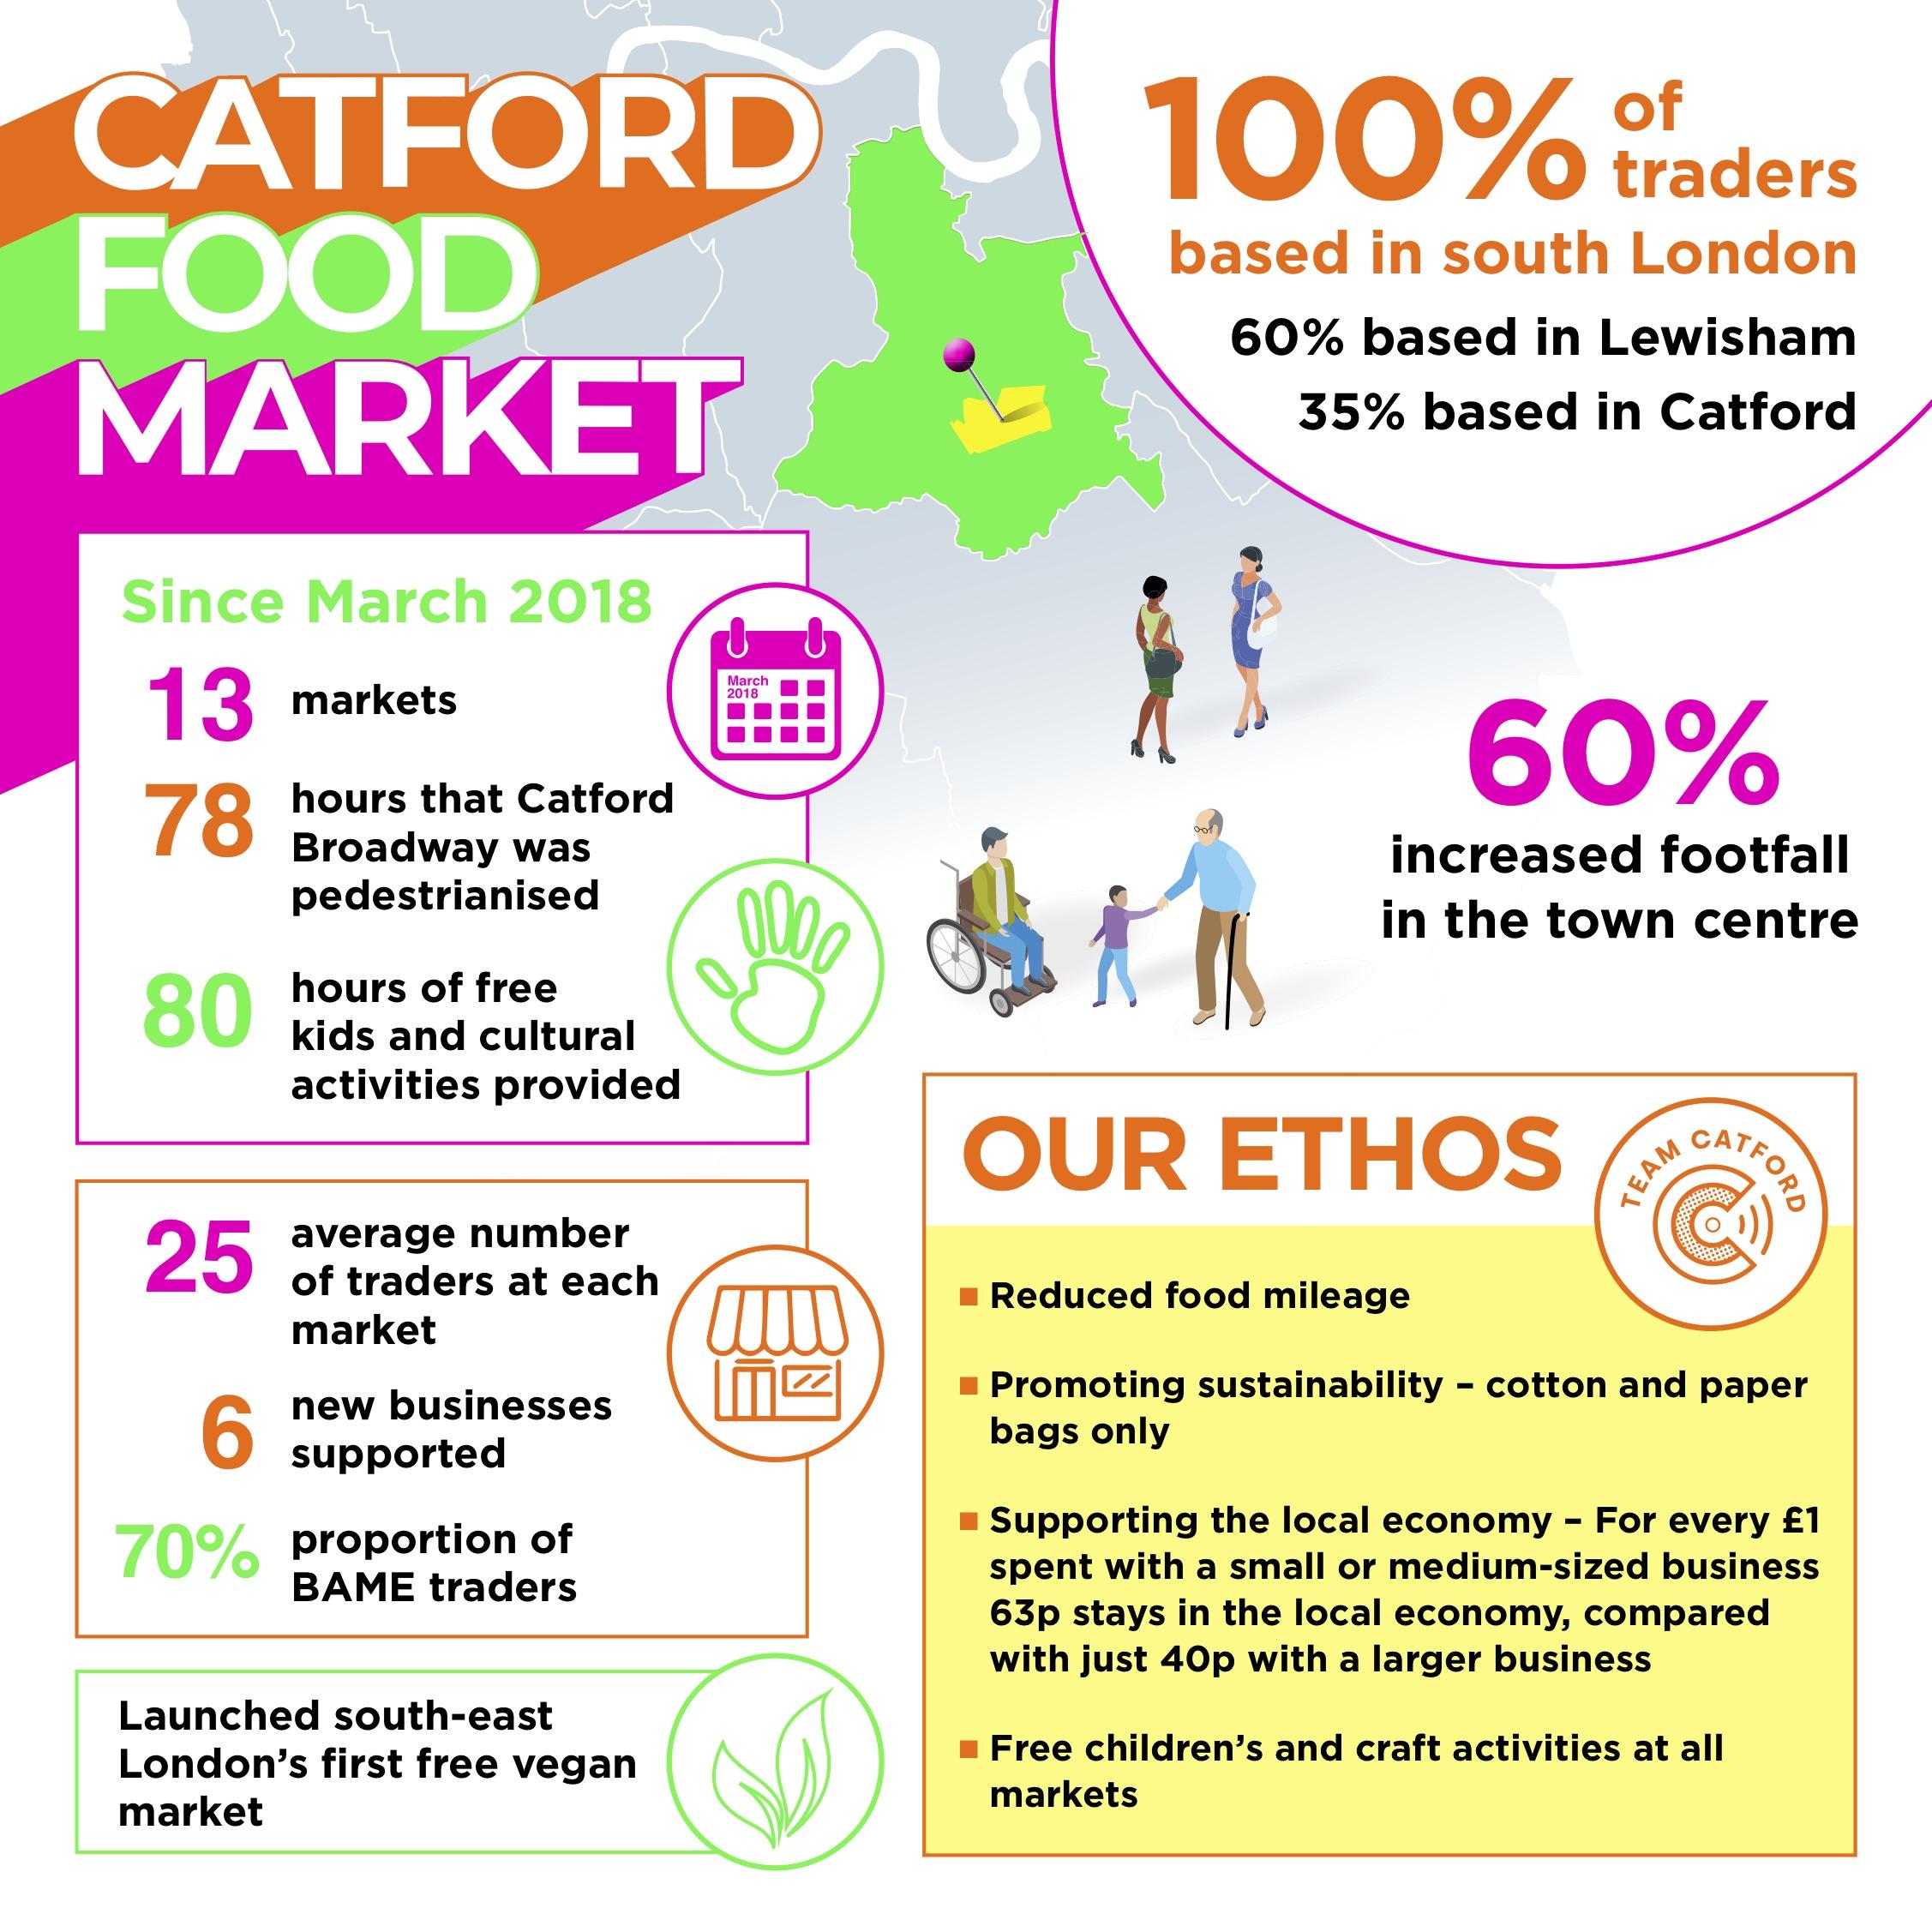 Catford Food Market Infographic_Final.jpg